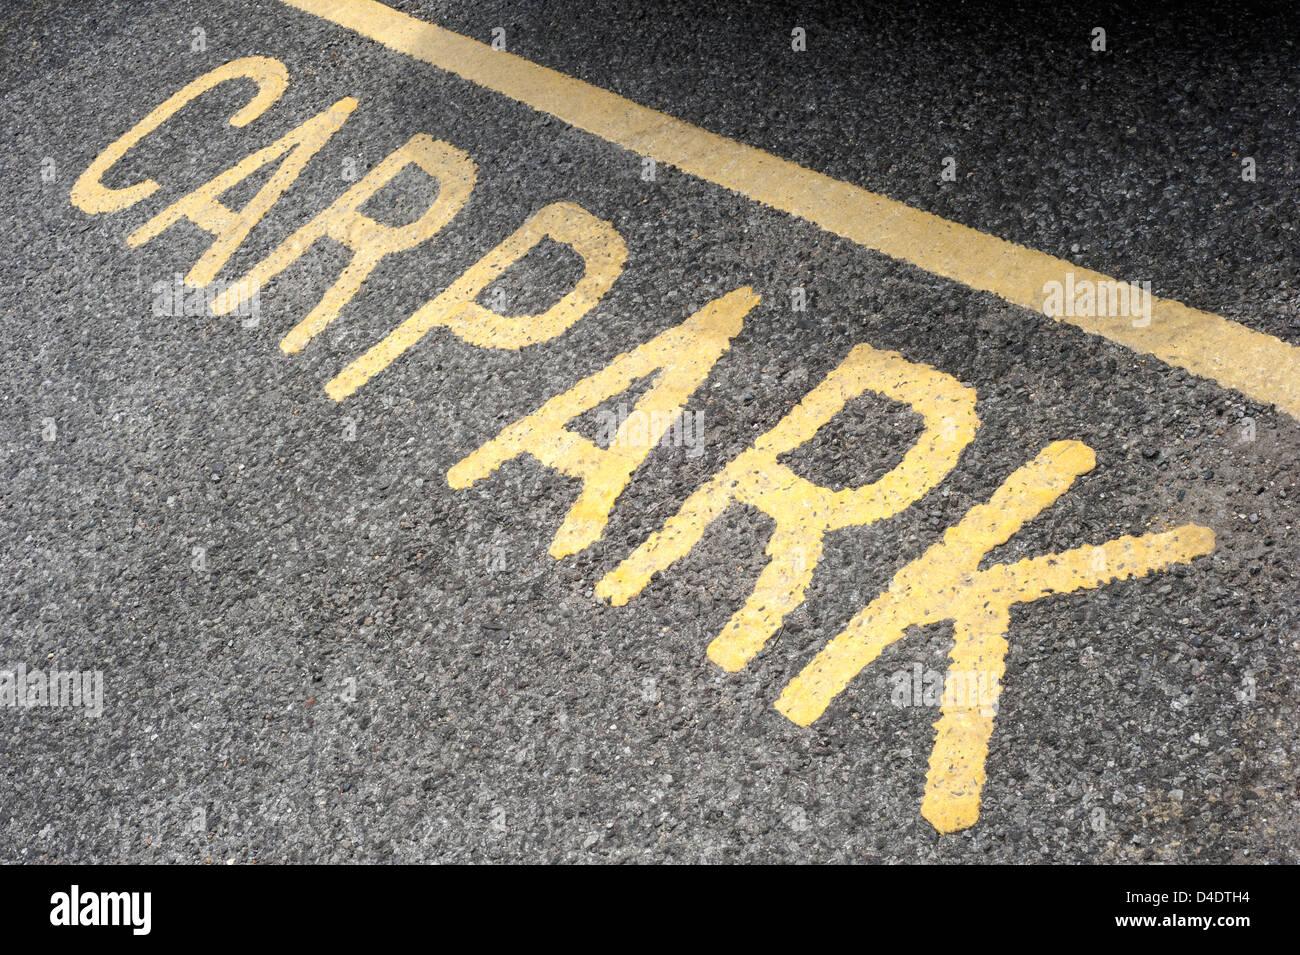 Car park marking sign, UK - Stock Image